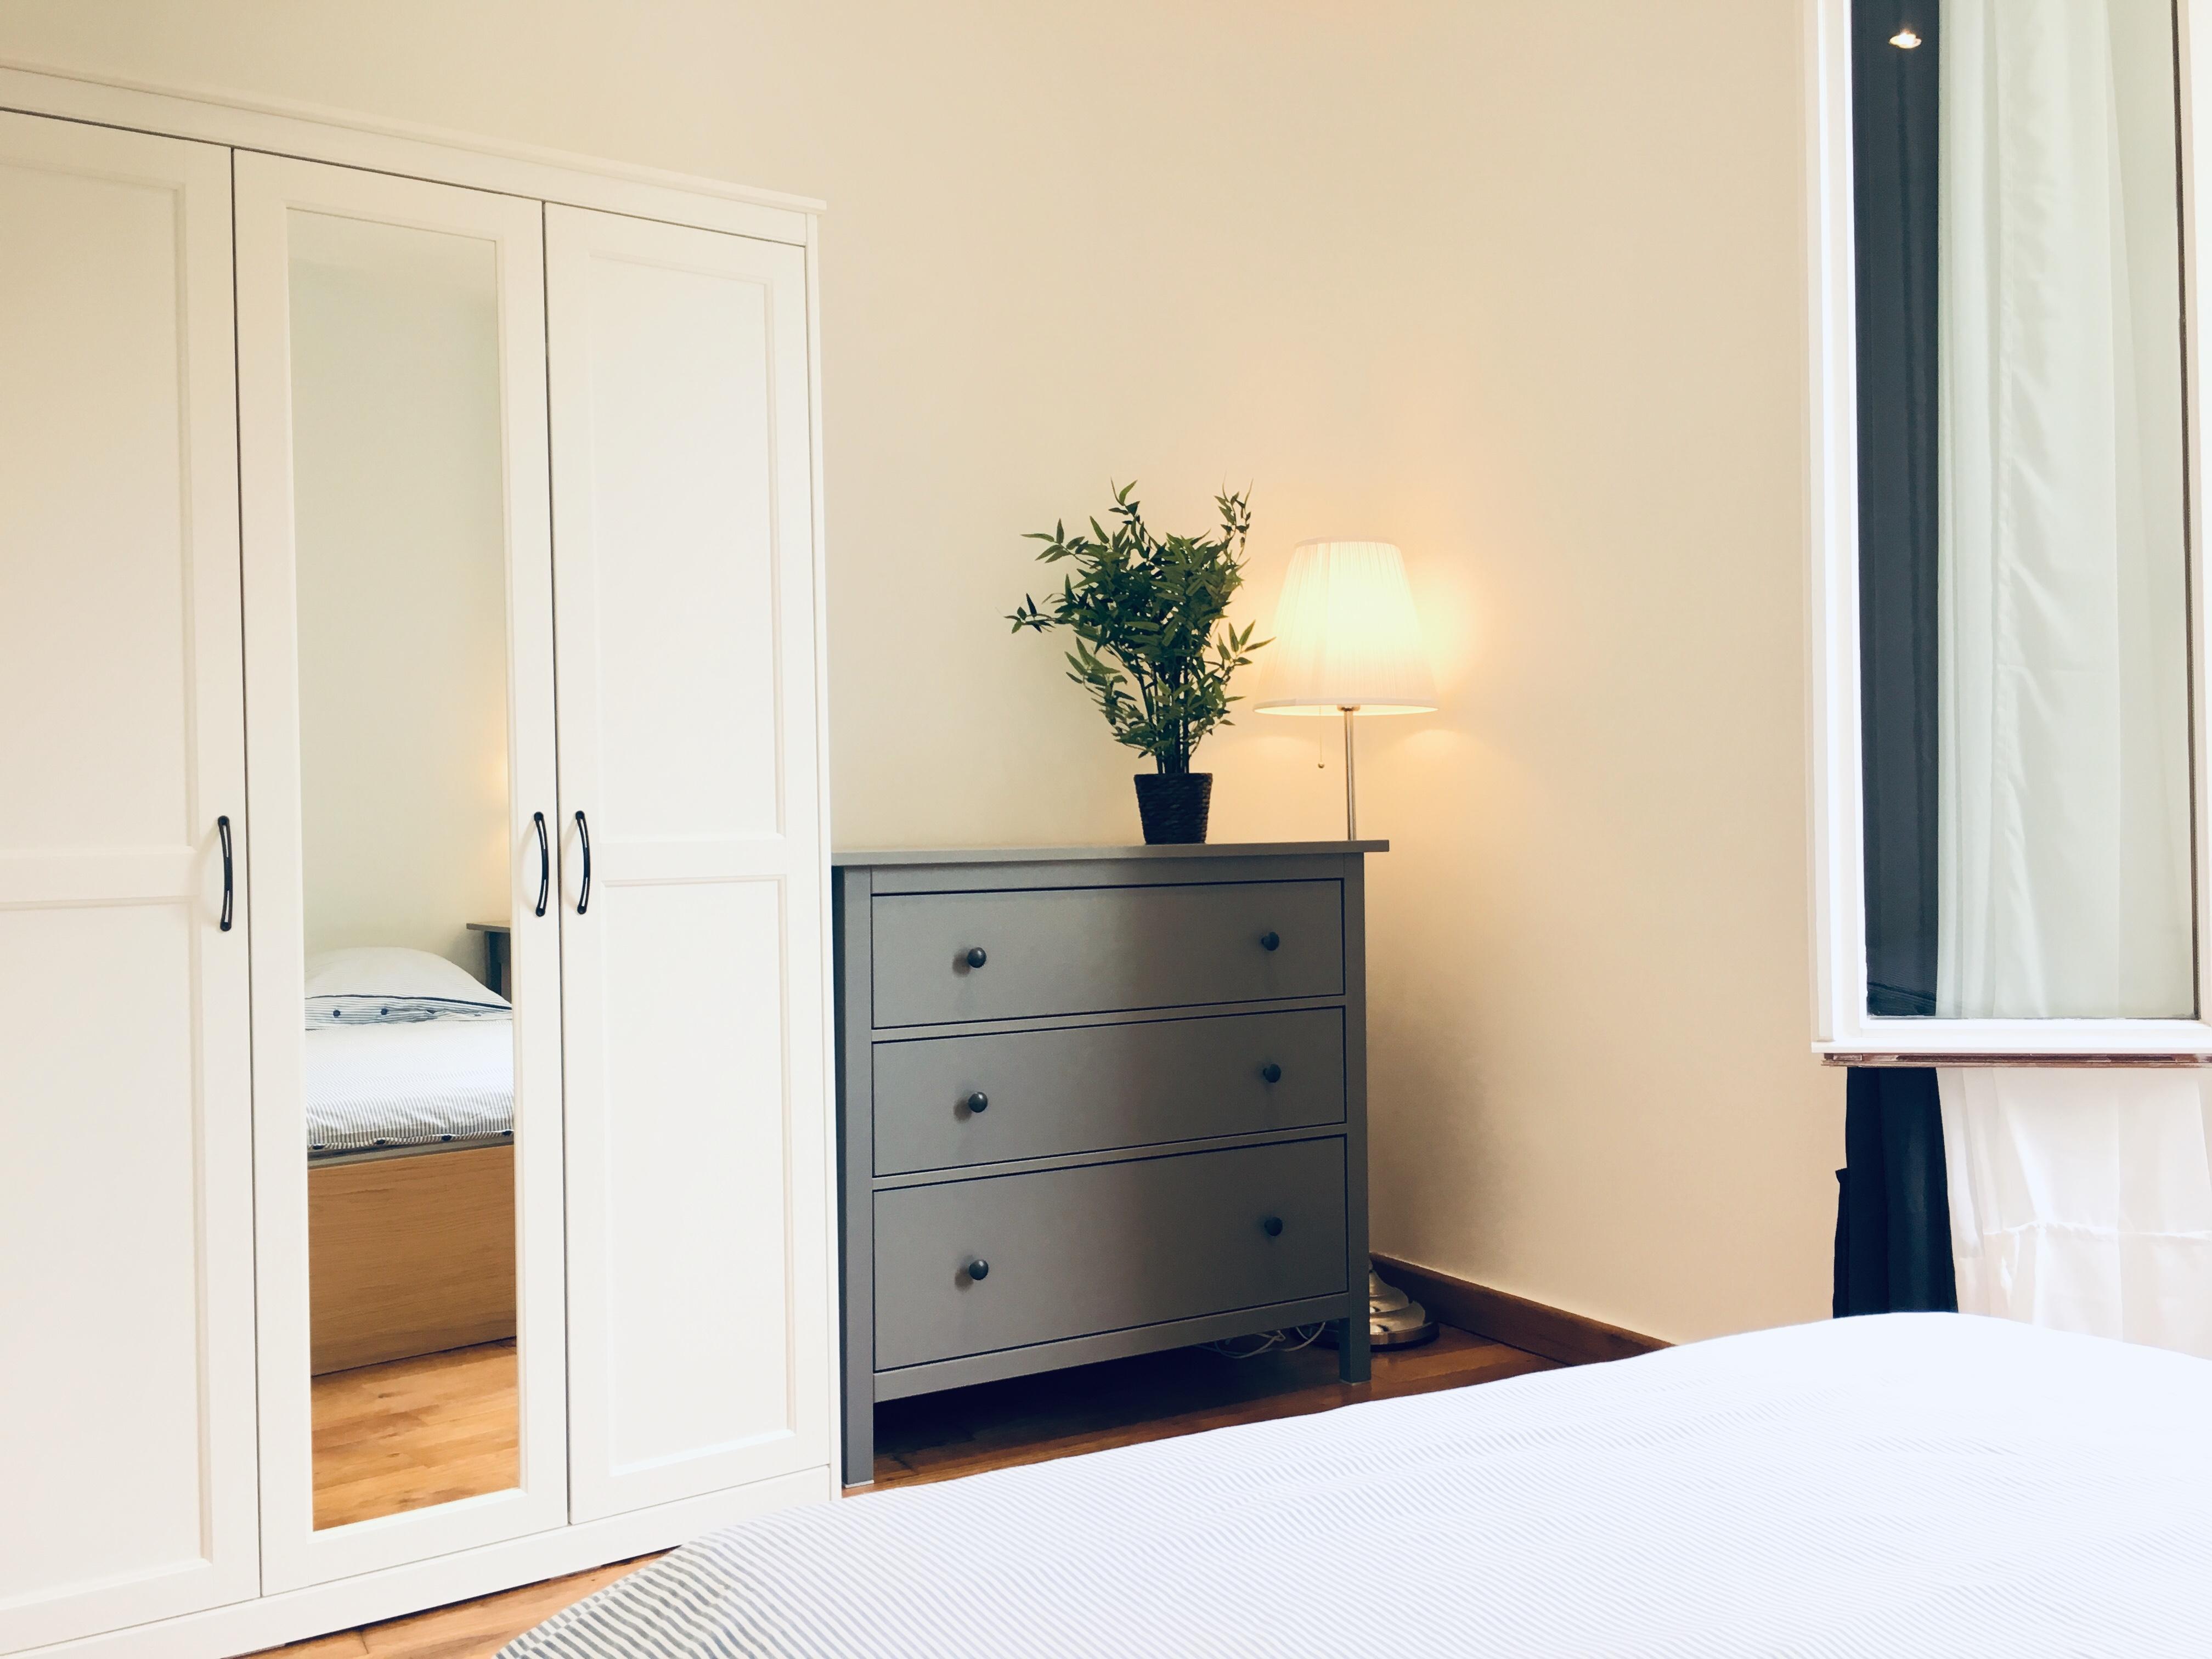 Insead housing premium flat for rent Fontainebleau apartment